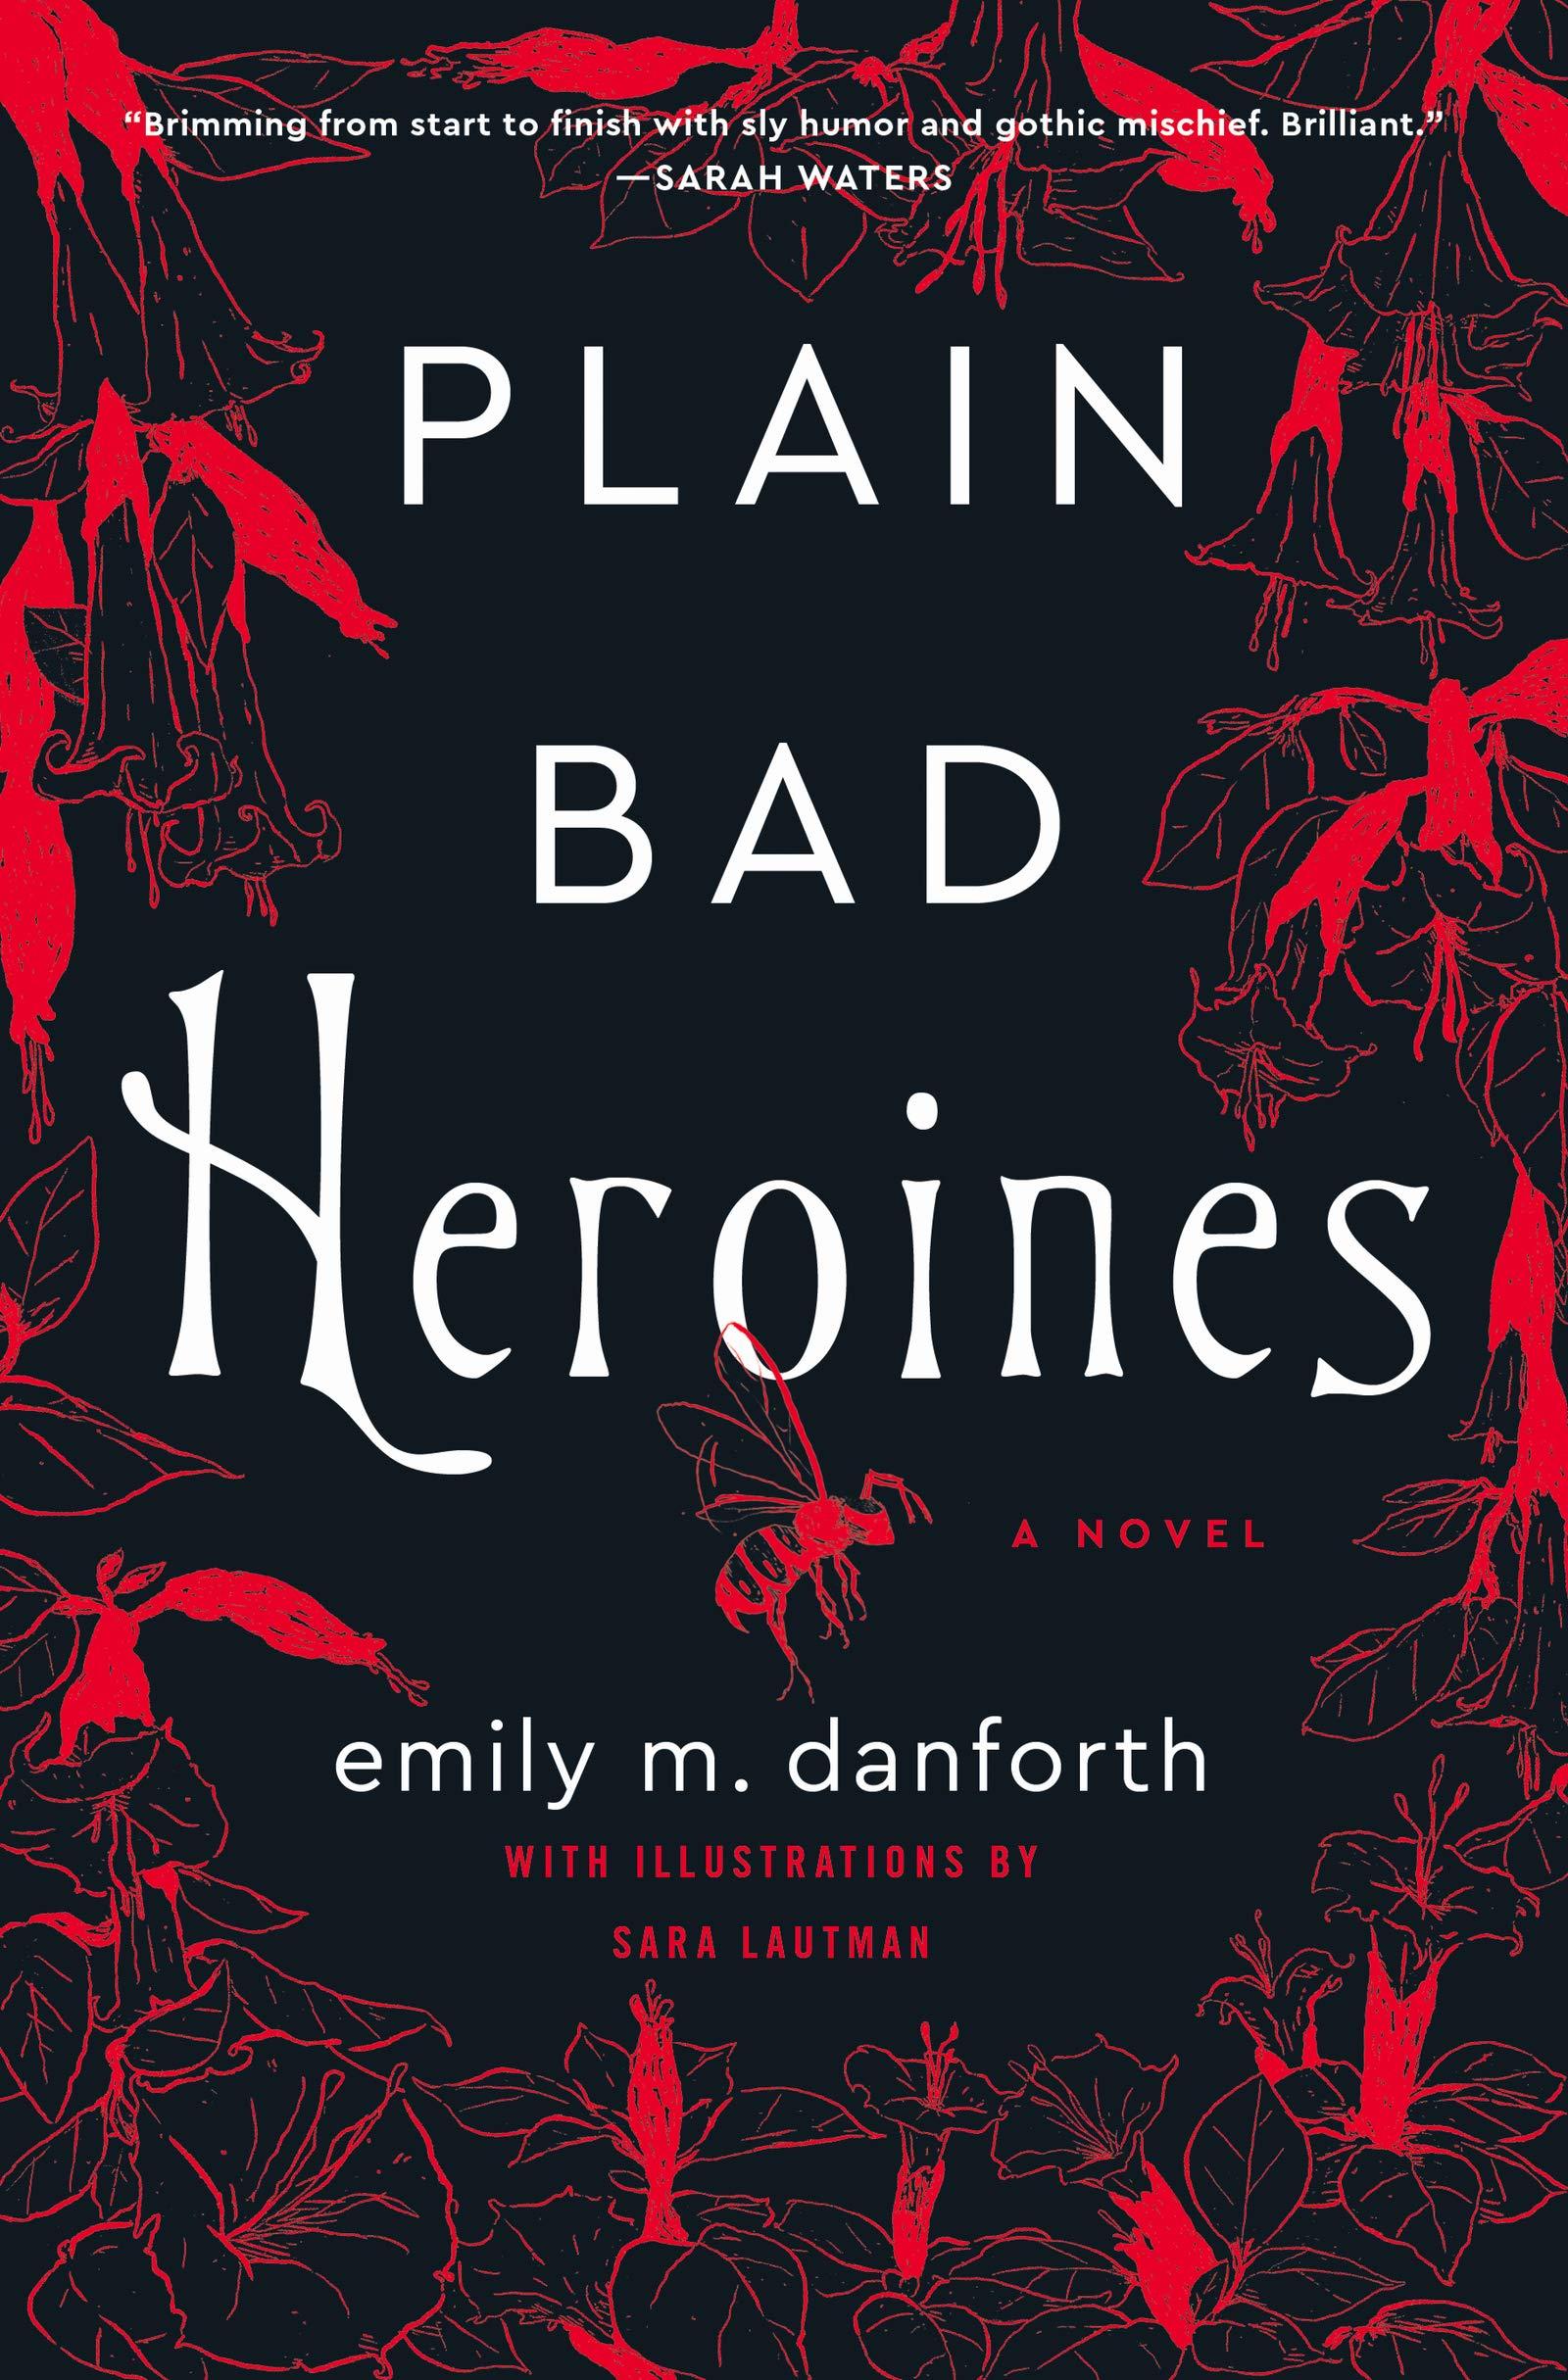 Amazon.com: Plain Bad Heroines: A Novel: 9780062942852: Danforth, Emily M.,  Lautman, Sara: Books